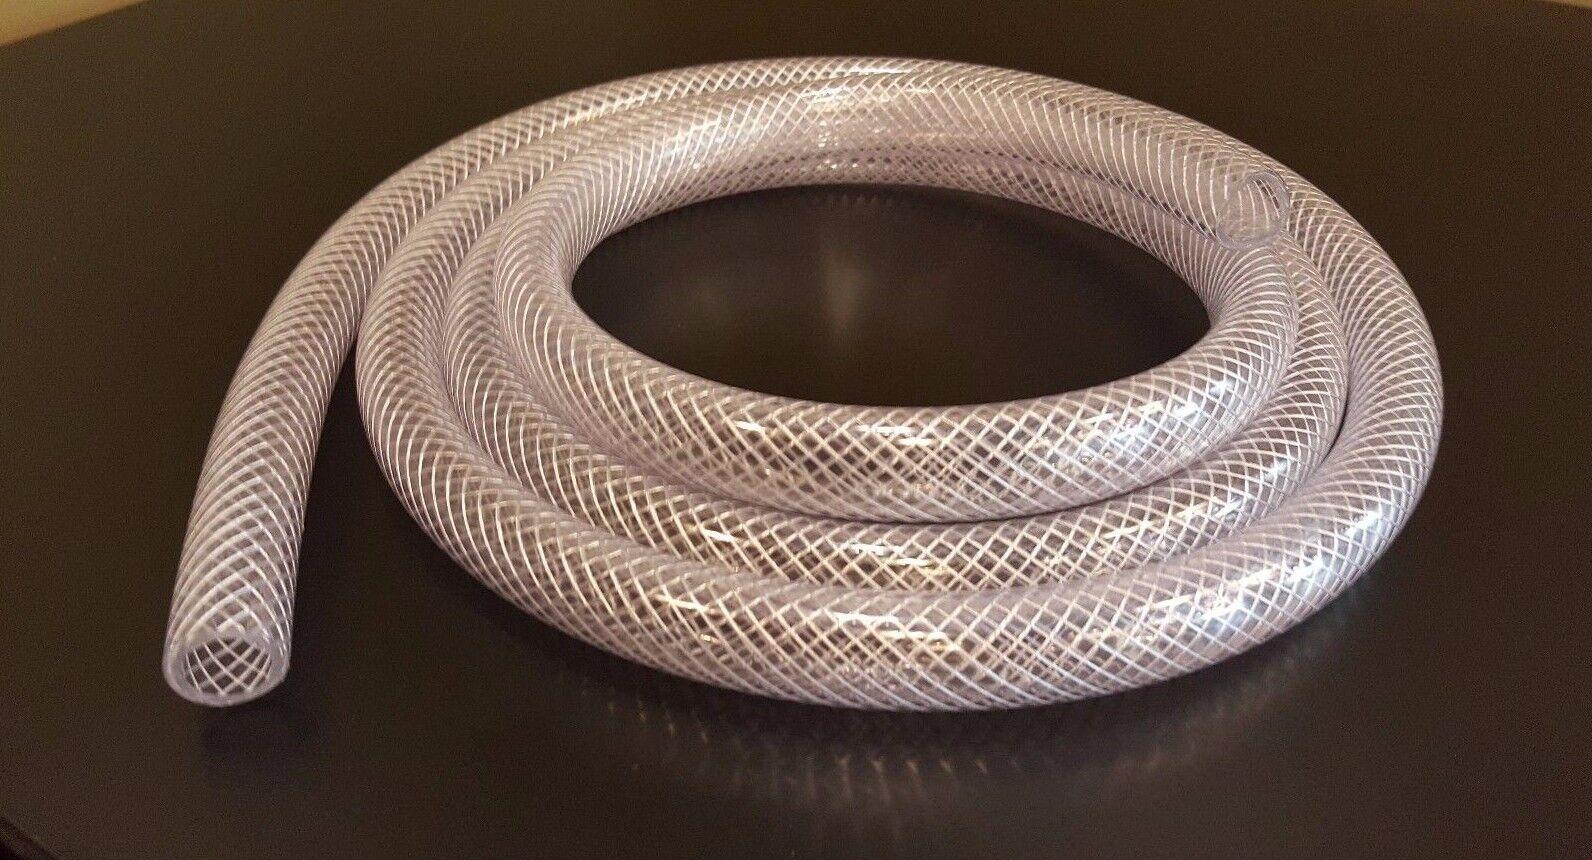 Copper pipe to flexible hose mitsubishi outlander car mats